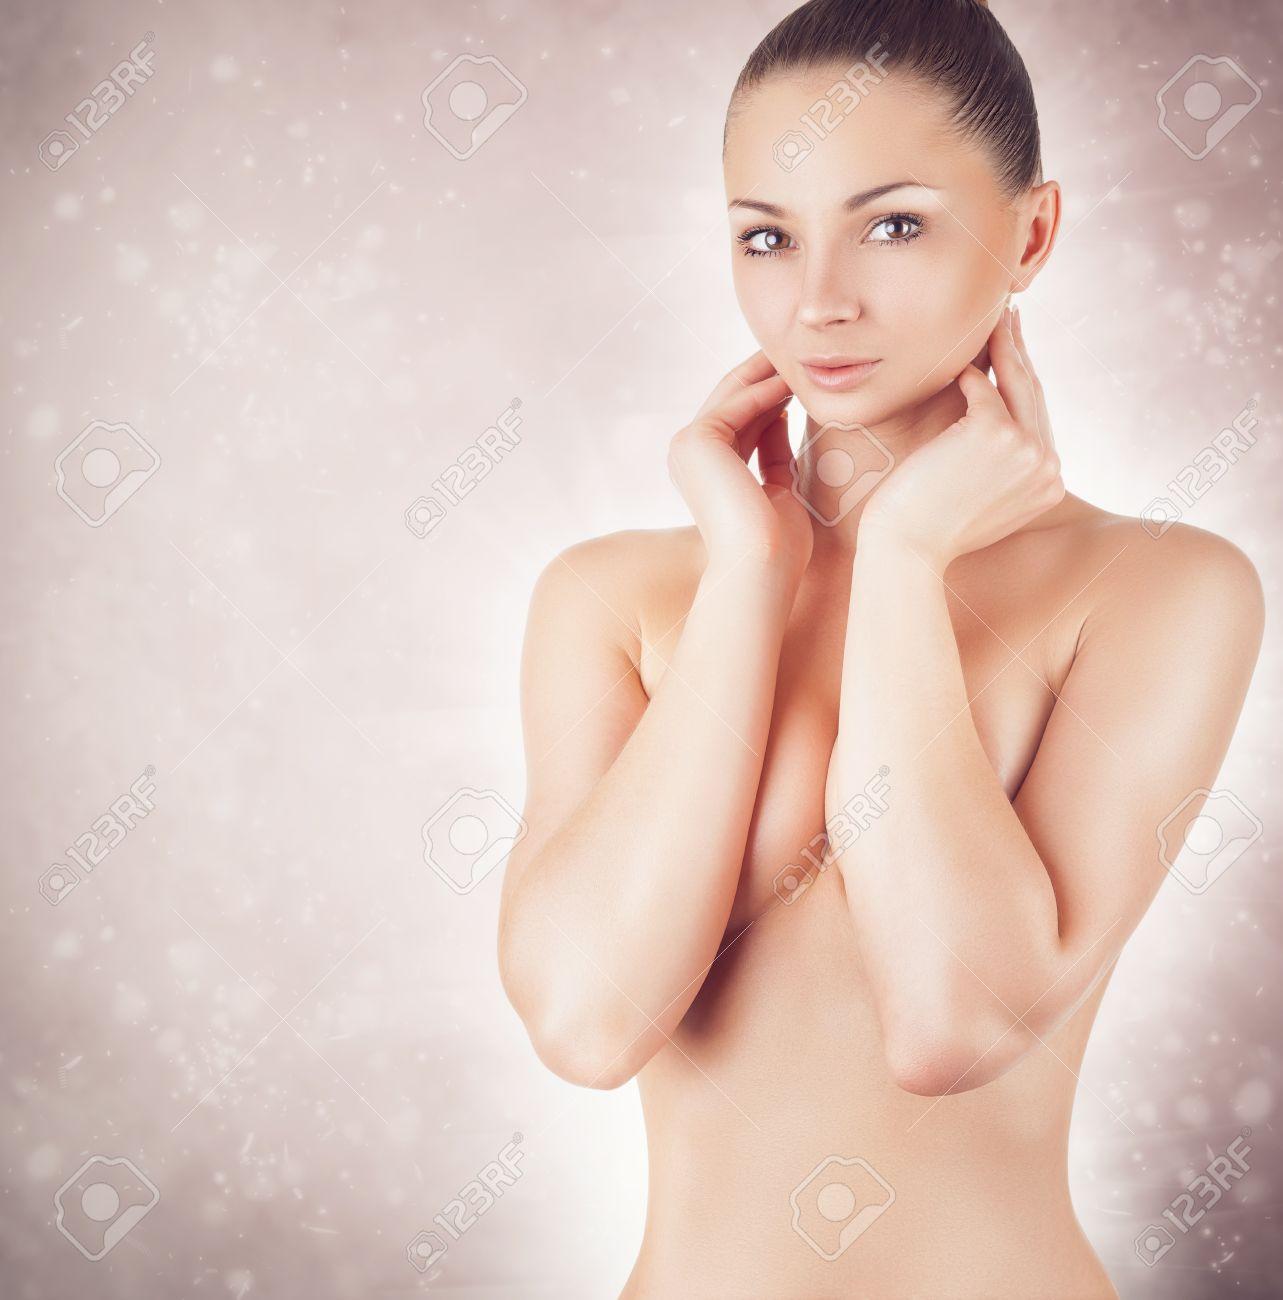 Beautiful bare breasts